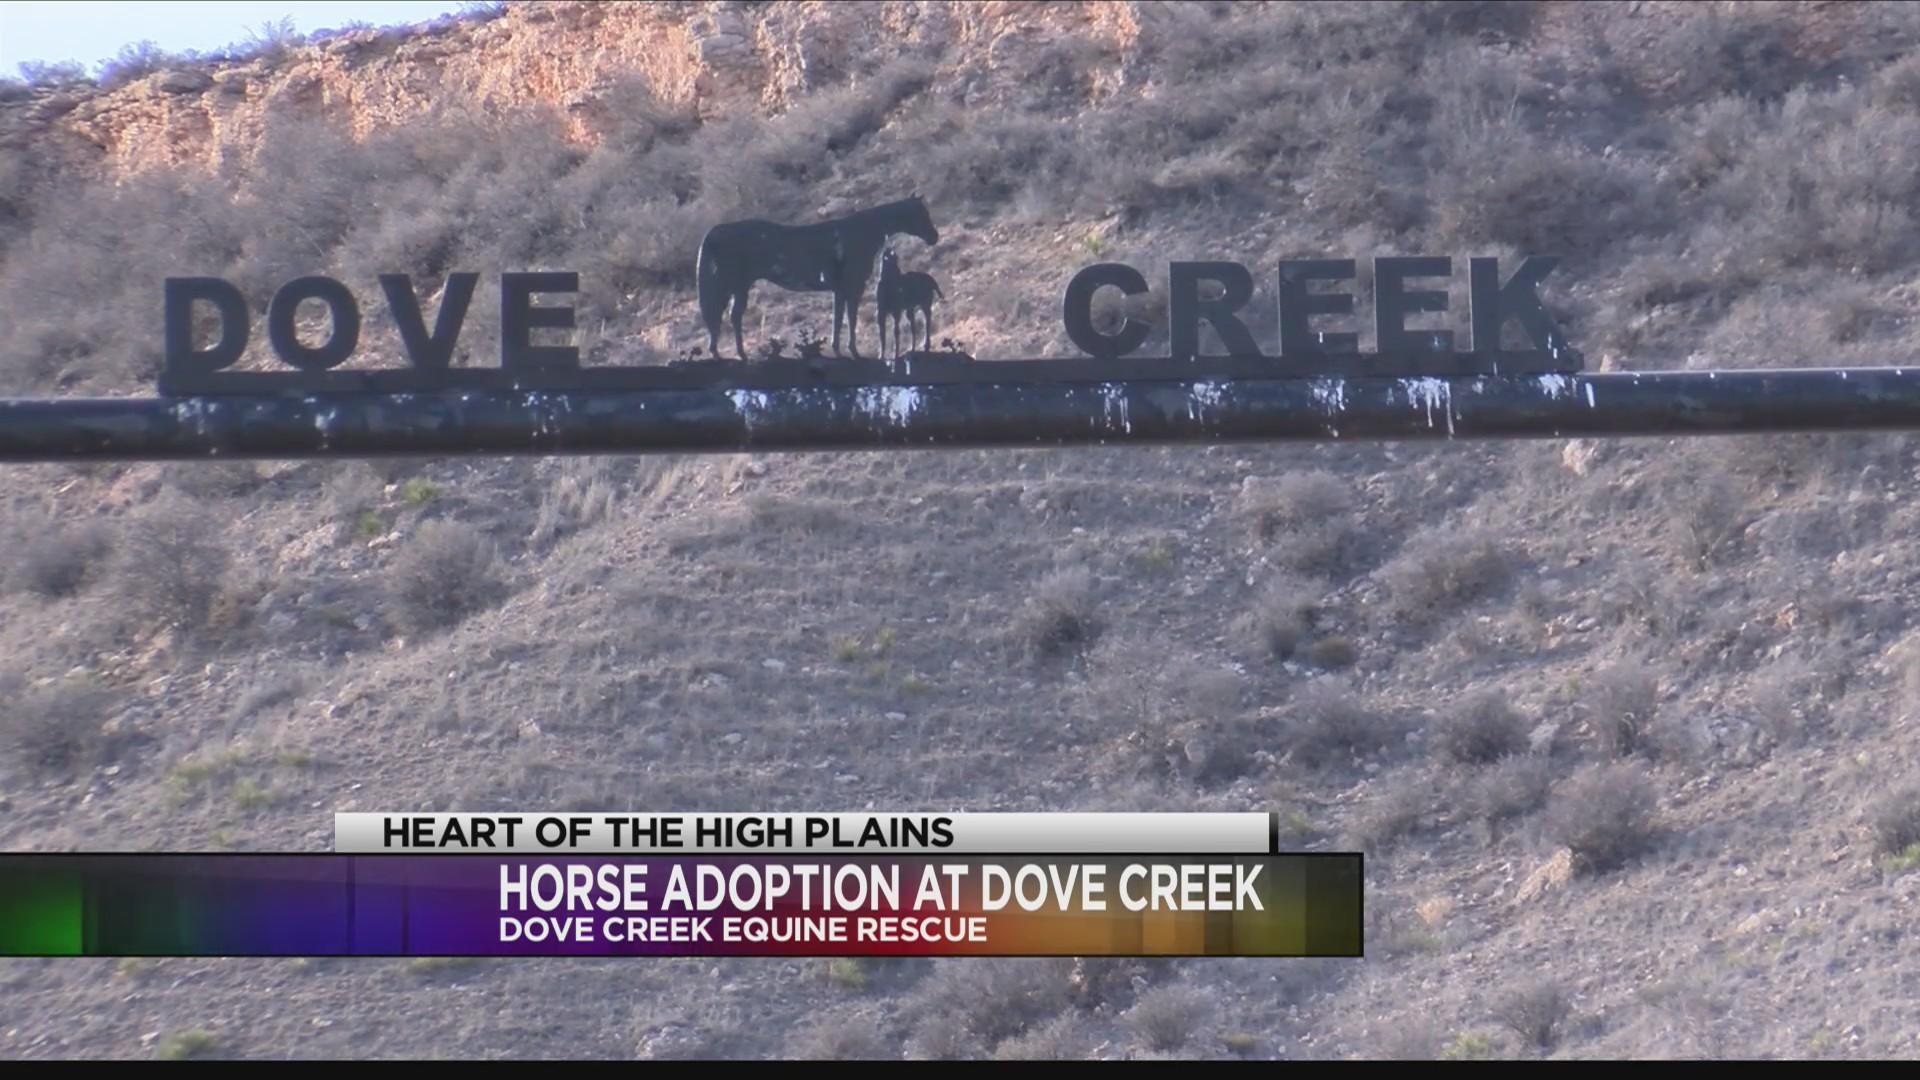 Dove Creek Equine Rescue Provides Safe Haven for Horses